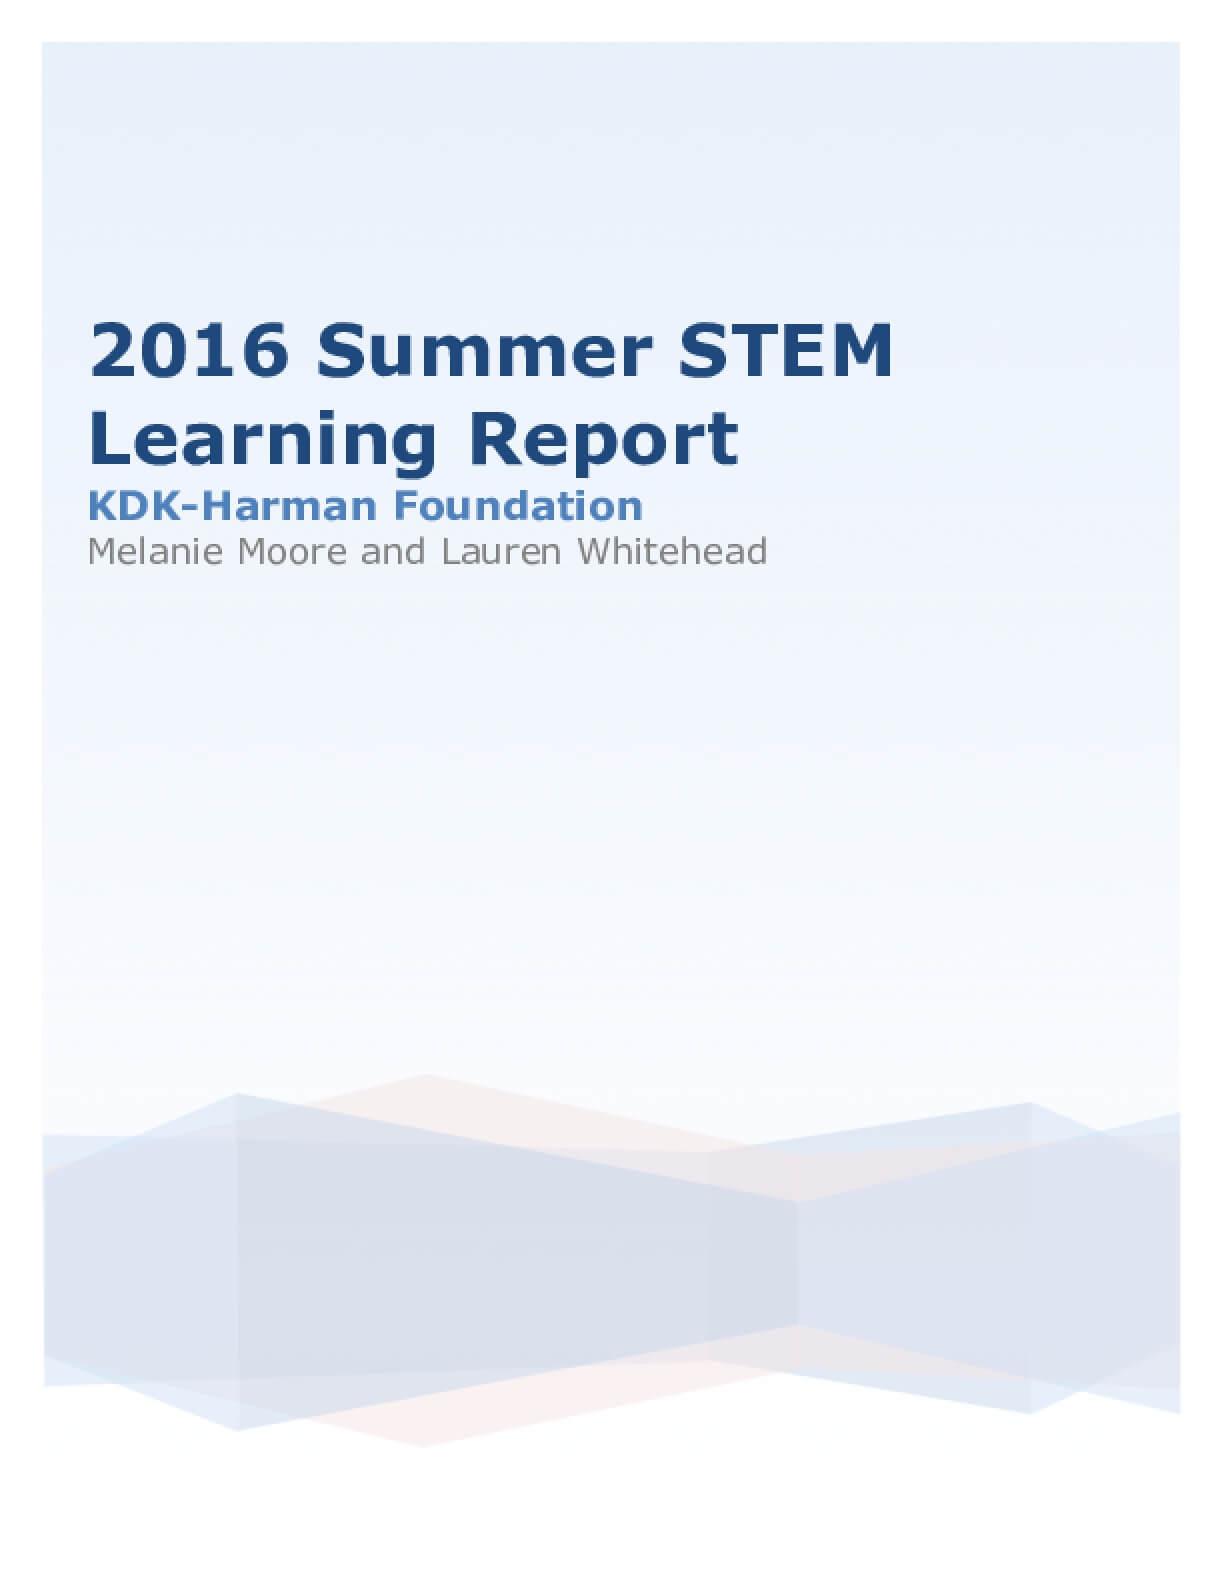 2016 Summer STEM Learning Report